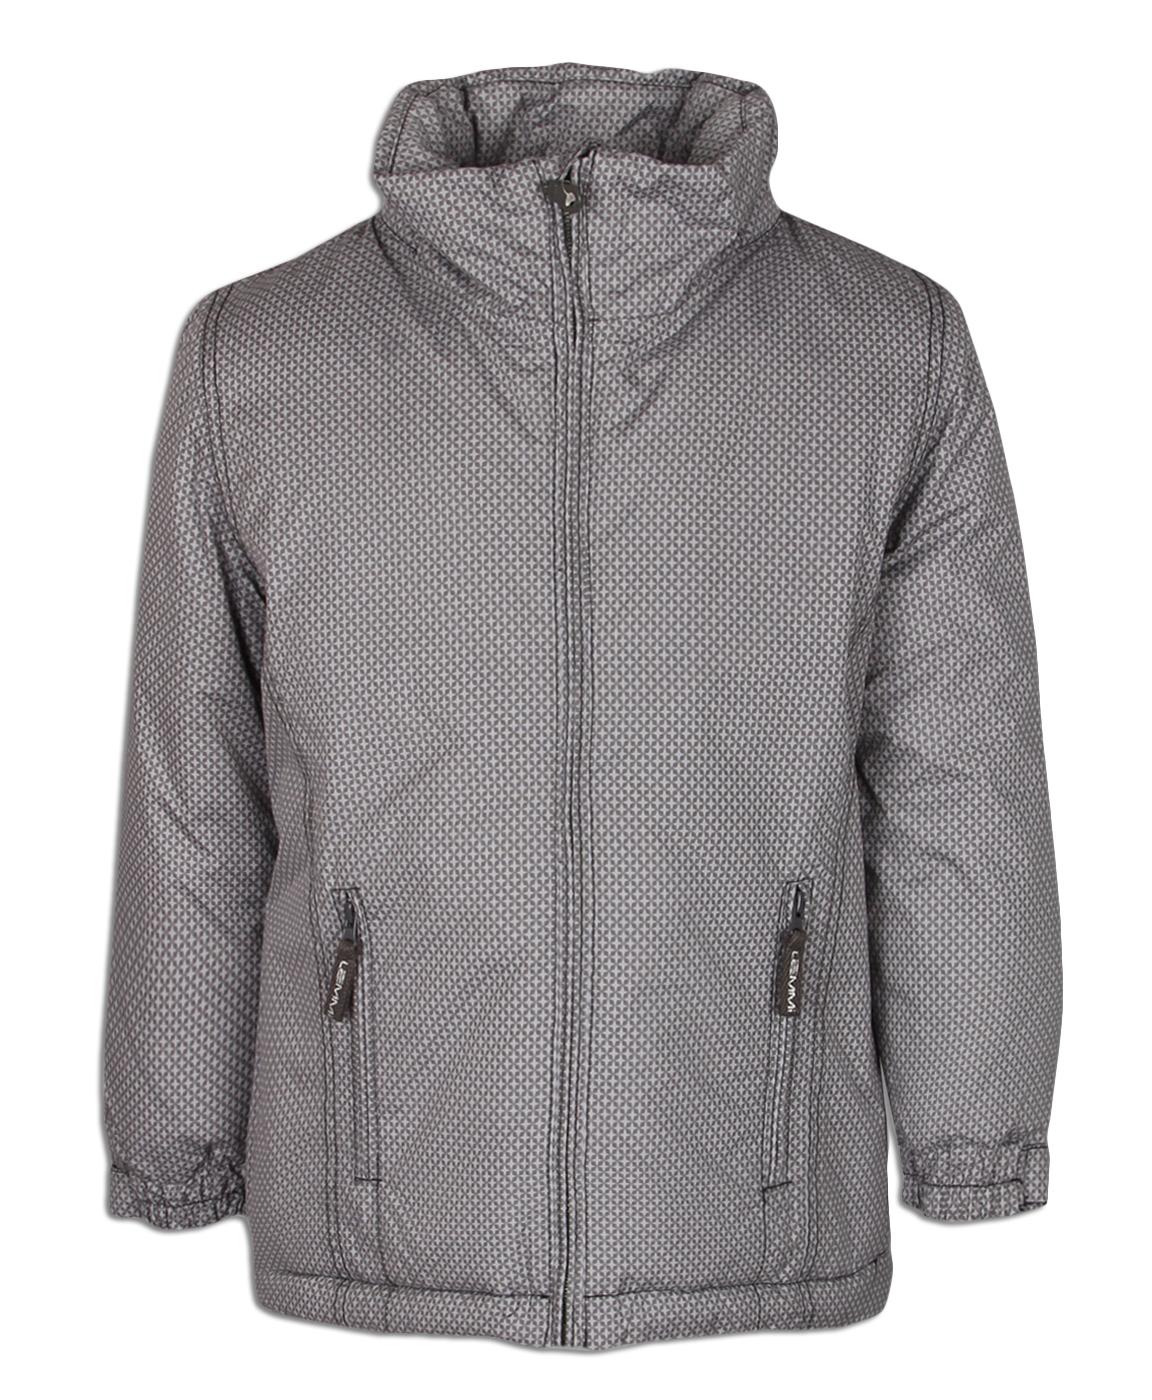 Куртка для девочки 550157256/188